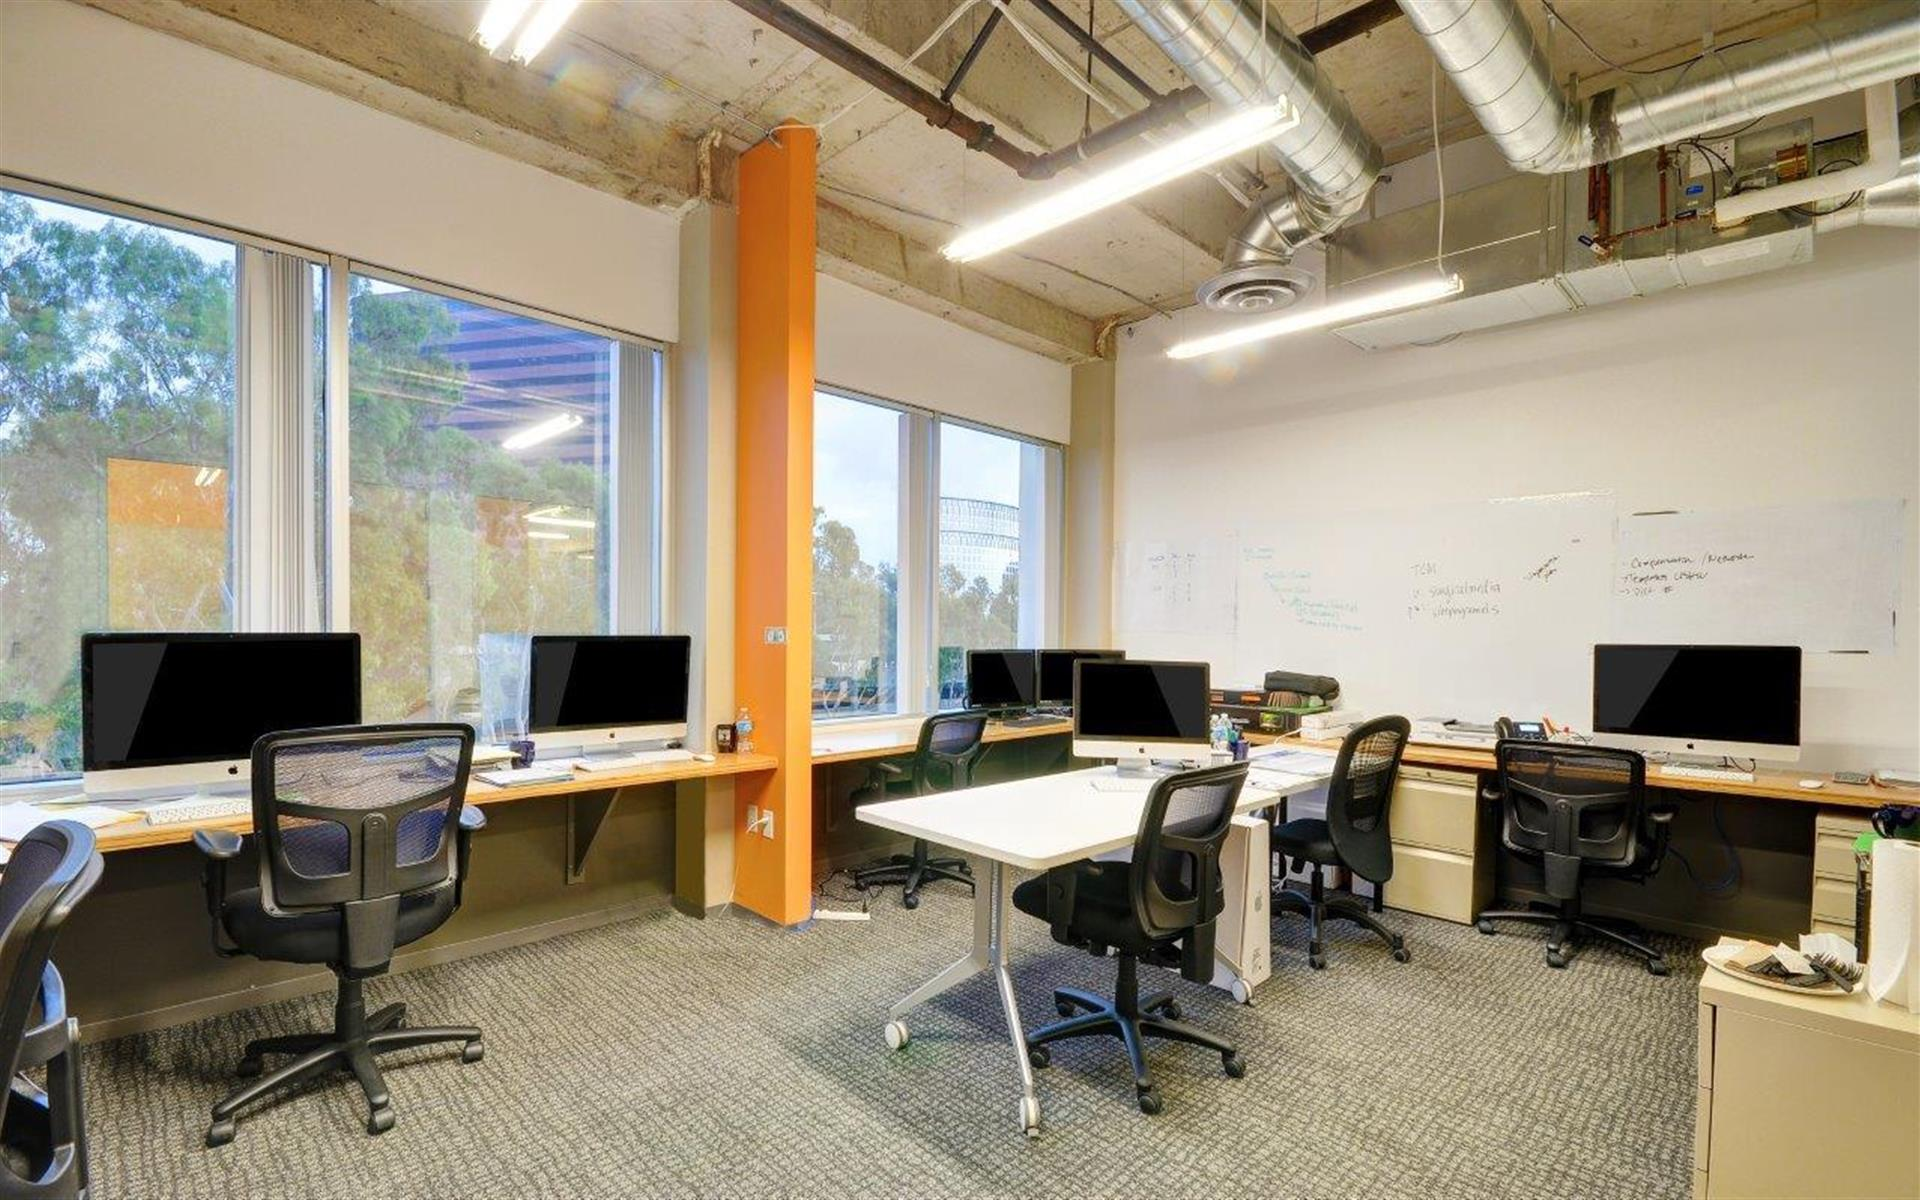 TechSpace - Costa Mesa - 6 Person Team Room Suite